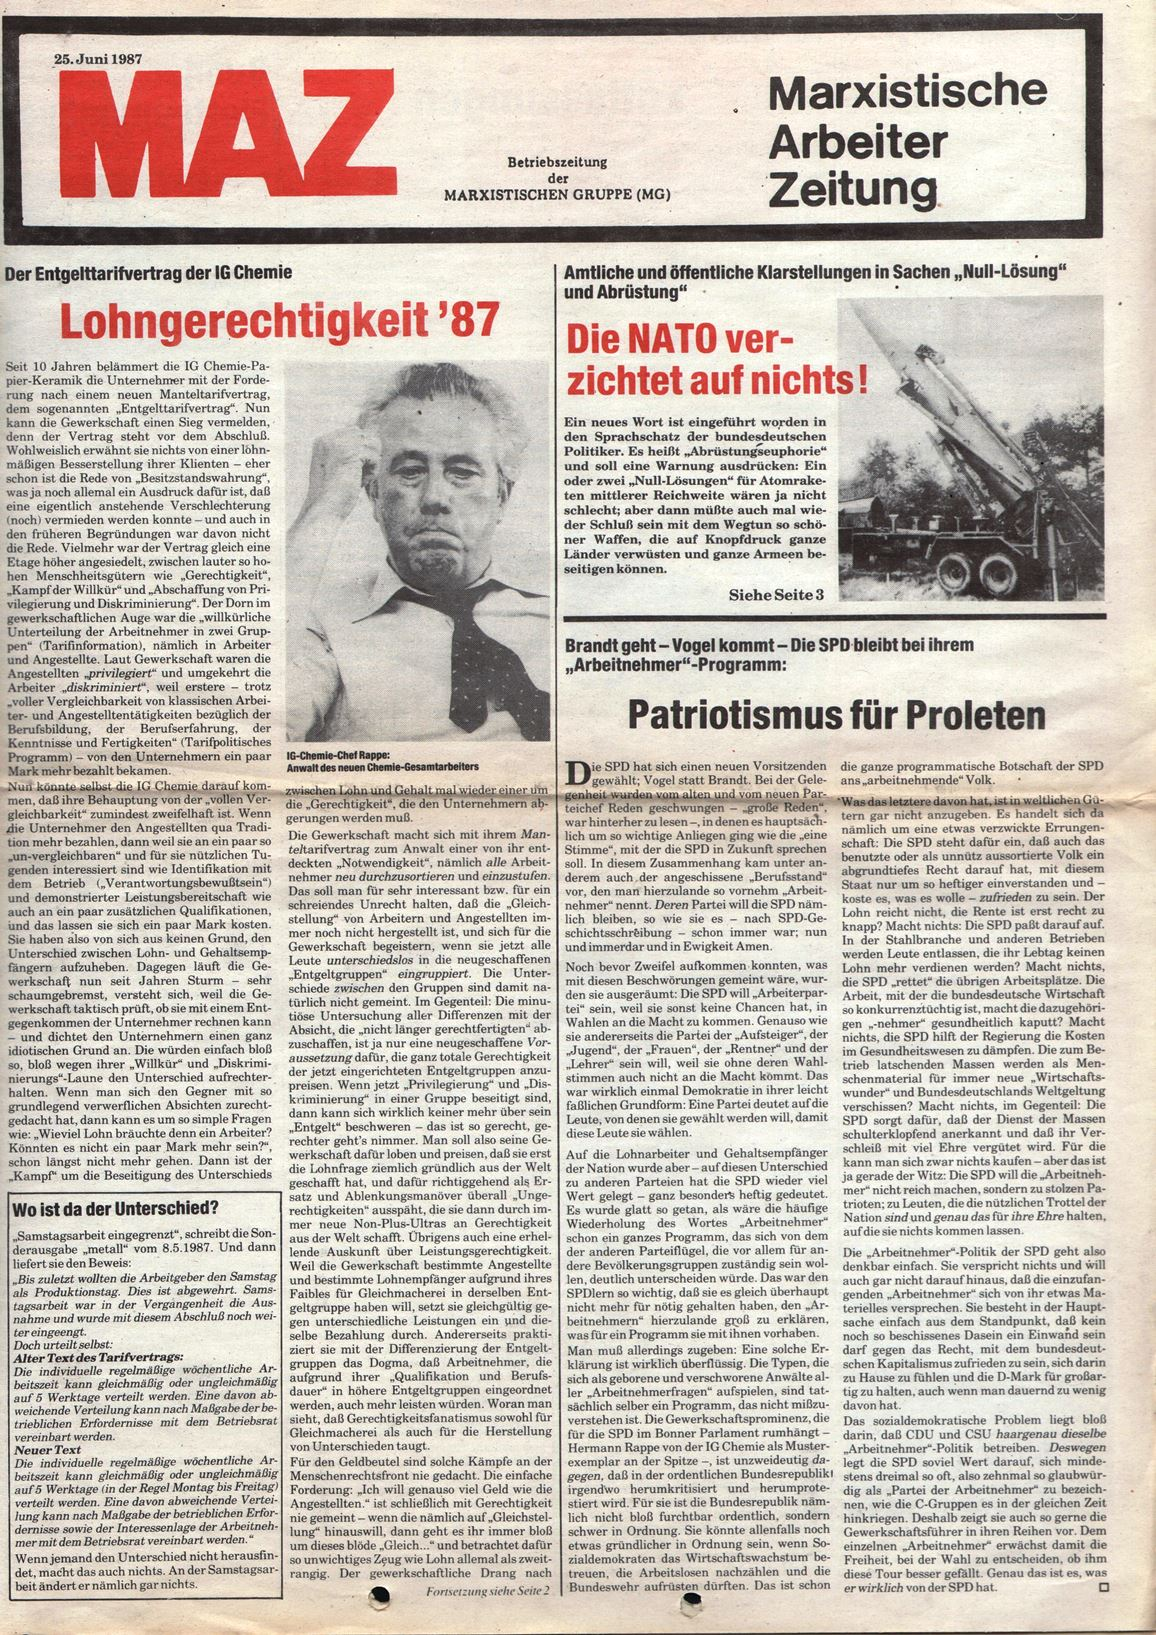 Muenchen_MG_MAZ_19870625_01